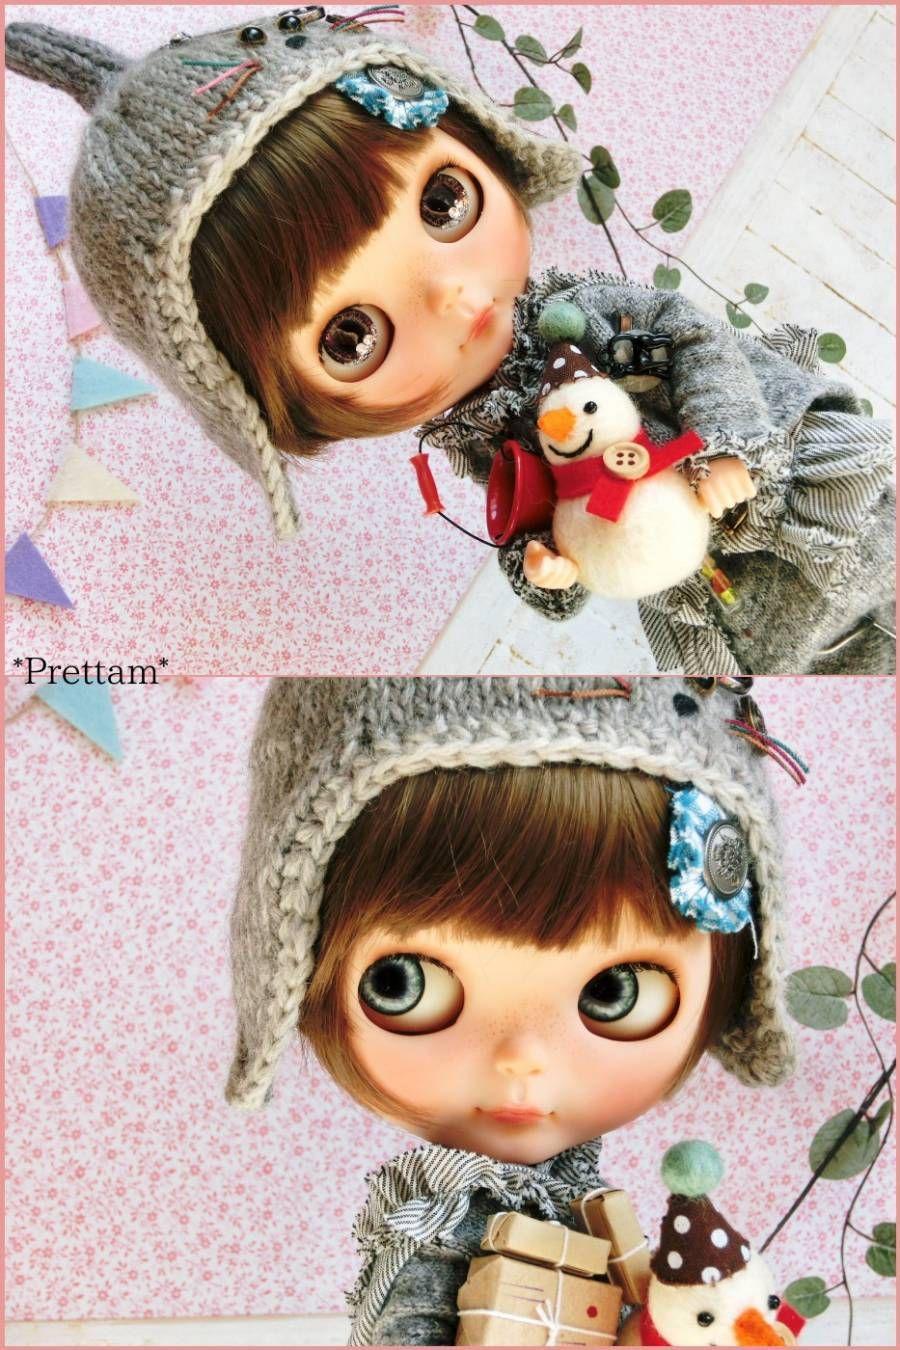 *Prettam*カスタムブライス*~Bambina vivaceⅡ~custom blythe - ヤフオク!